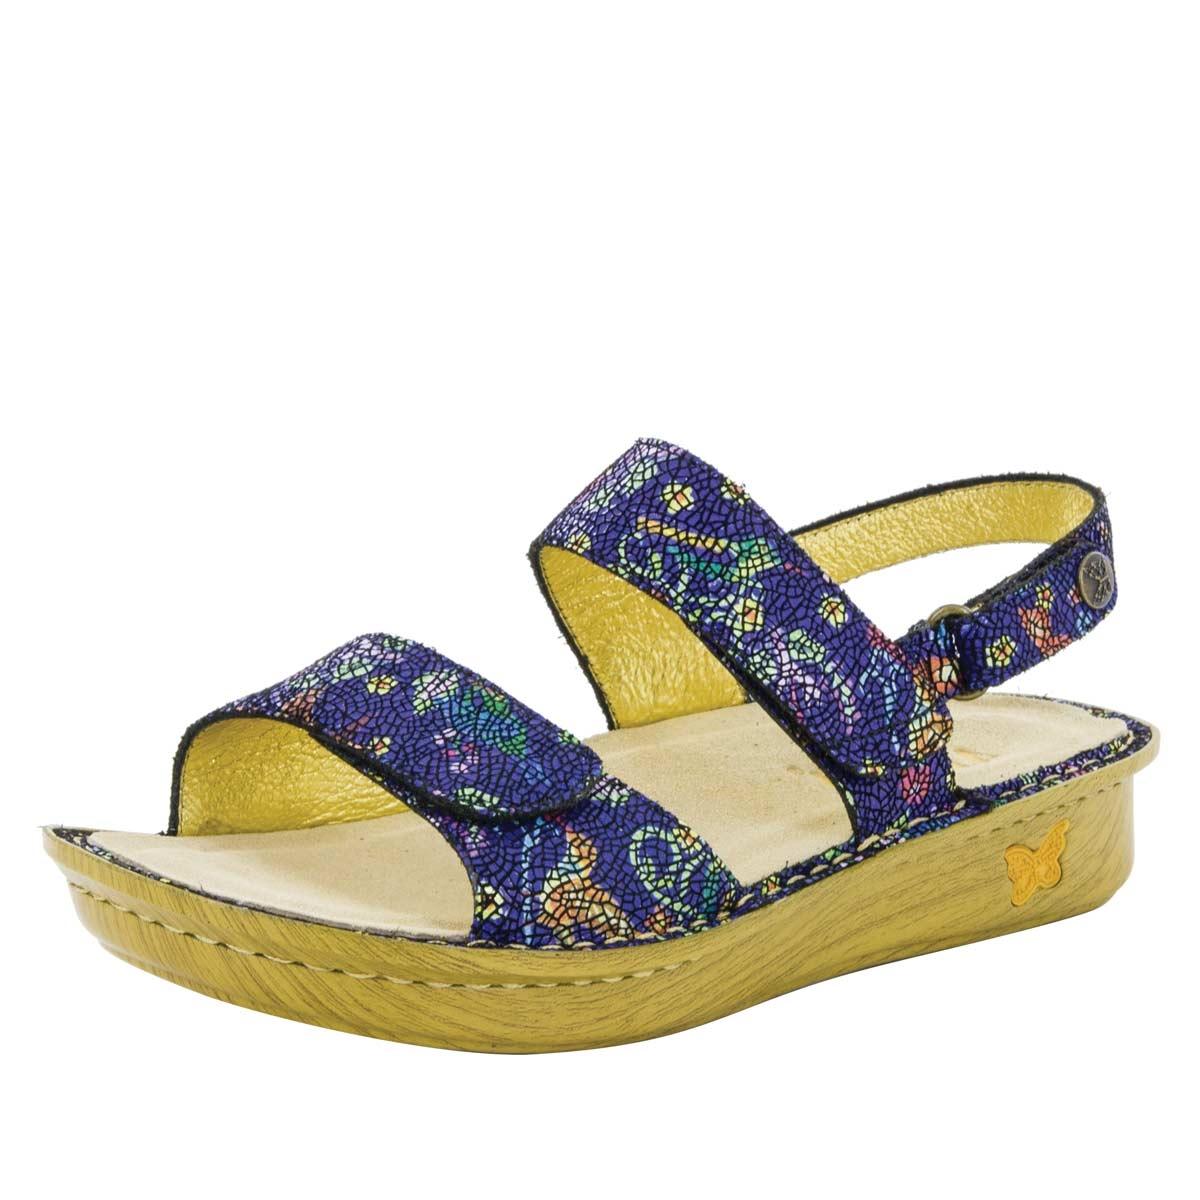 Verona Birdland Sandals 1Ironx